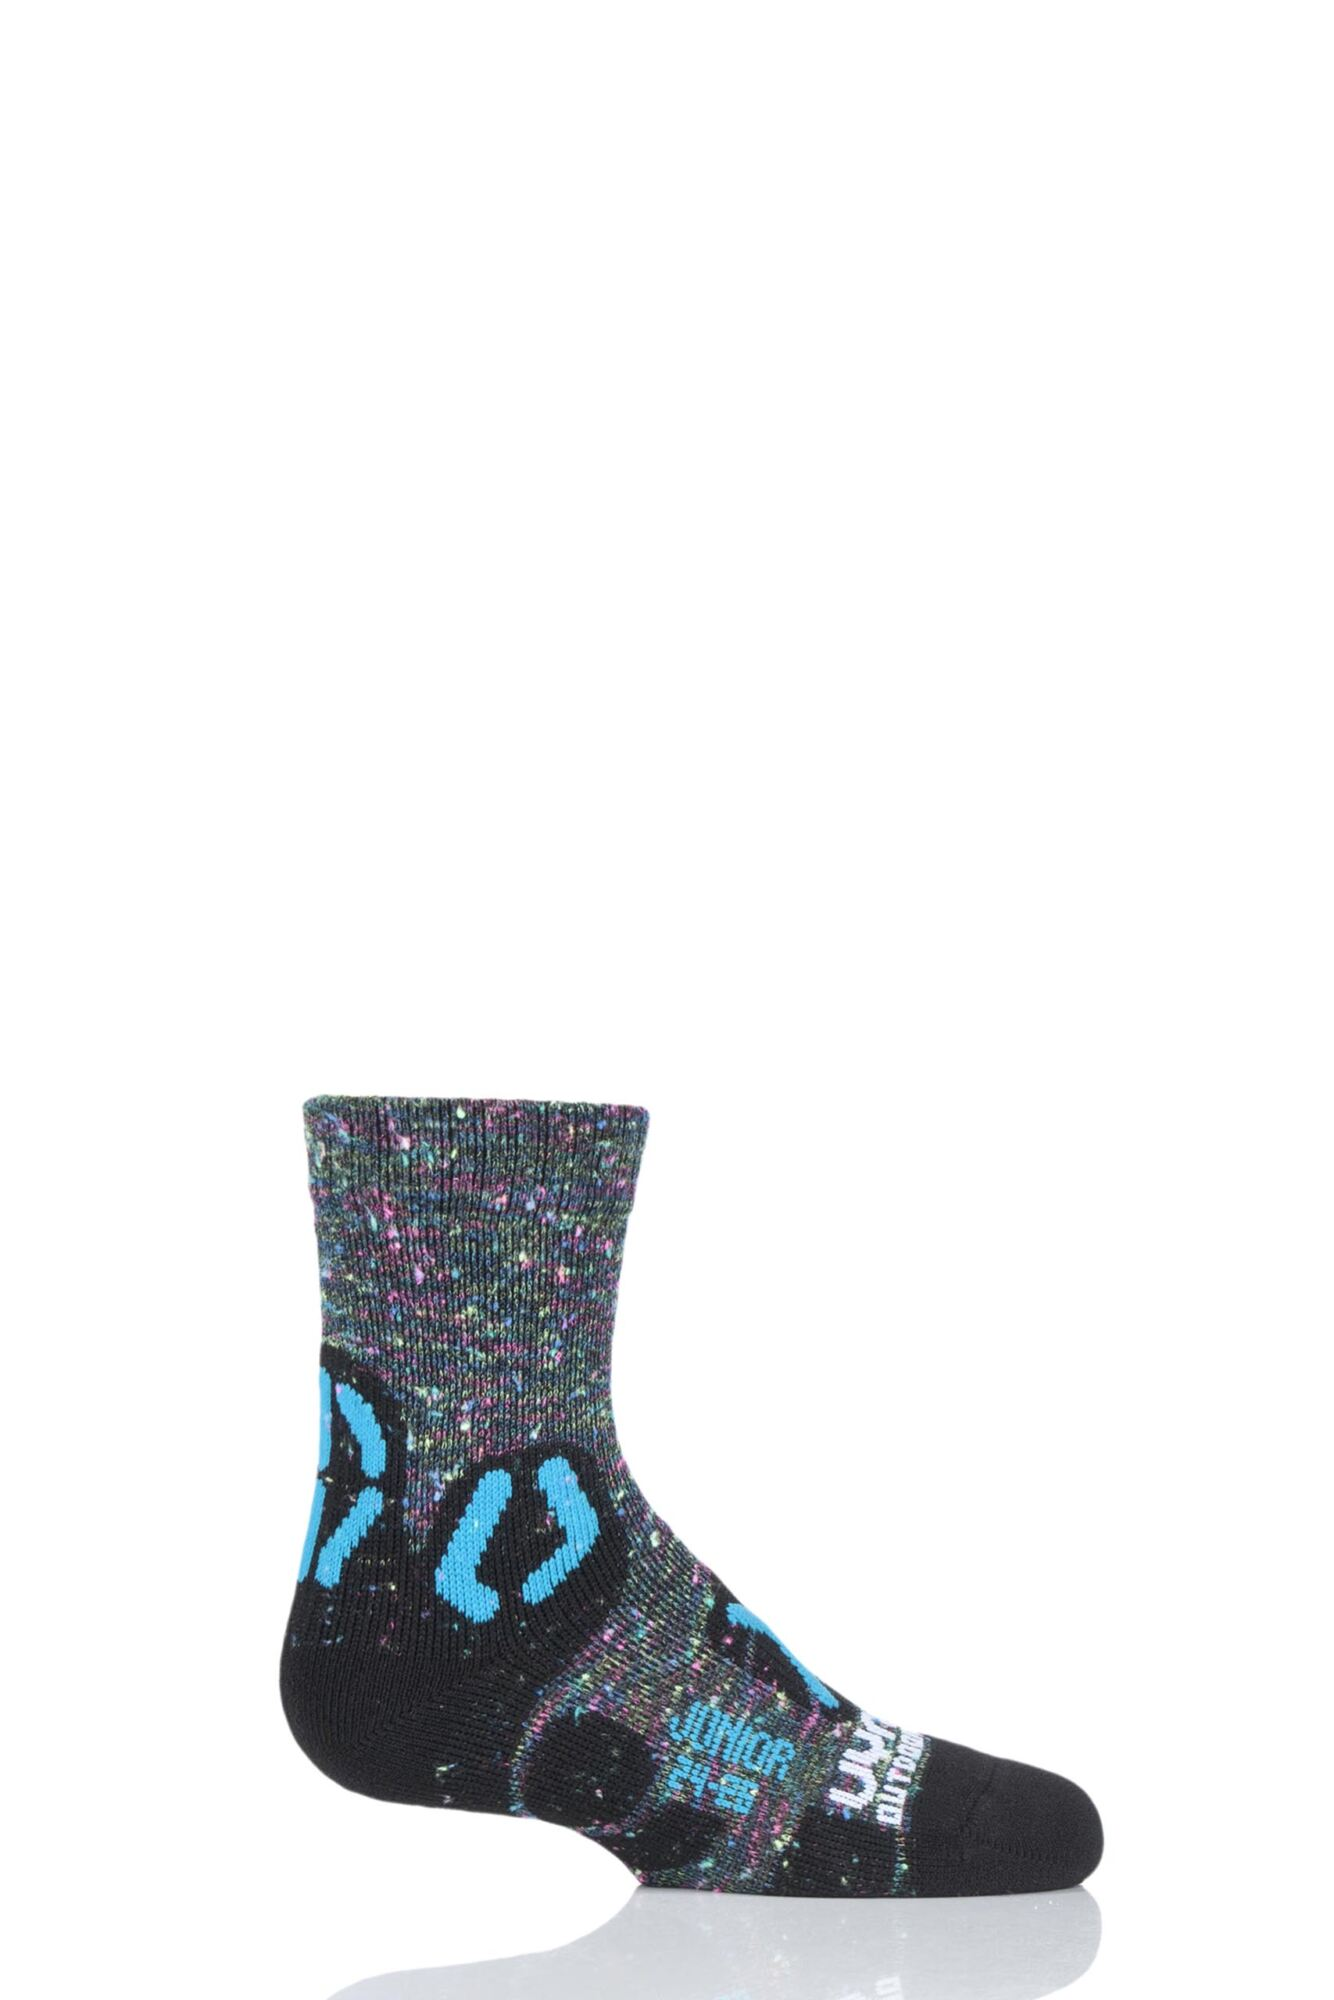 1 Pair Junior Outdoor Explorer Socks Kids Unisex - Uyn